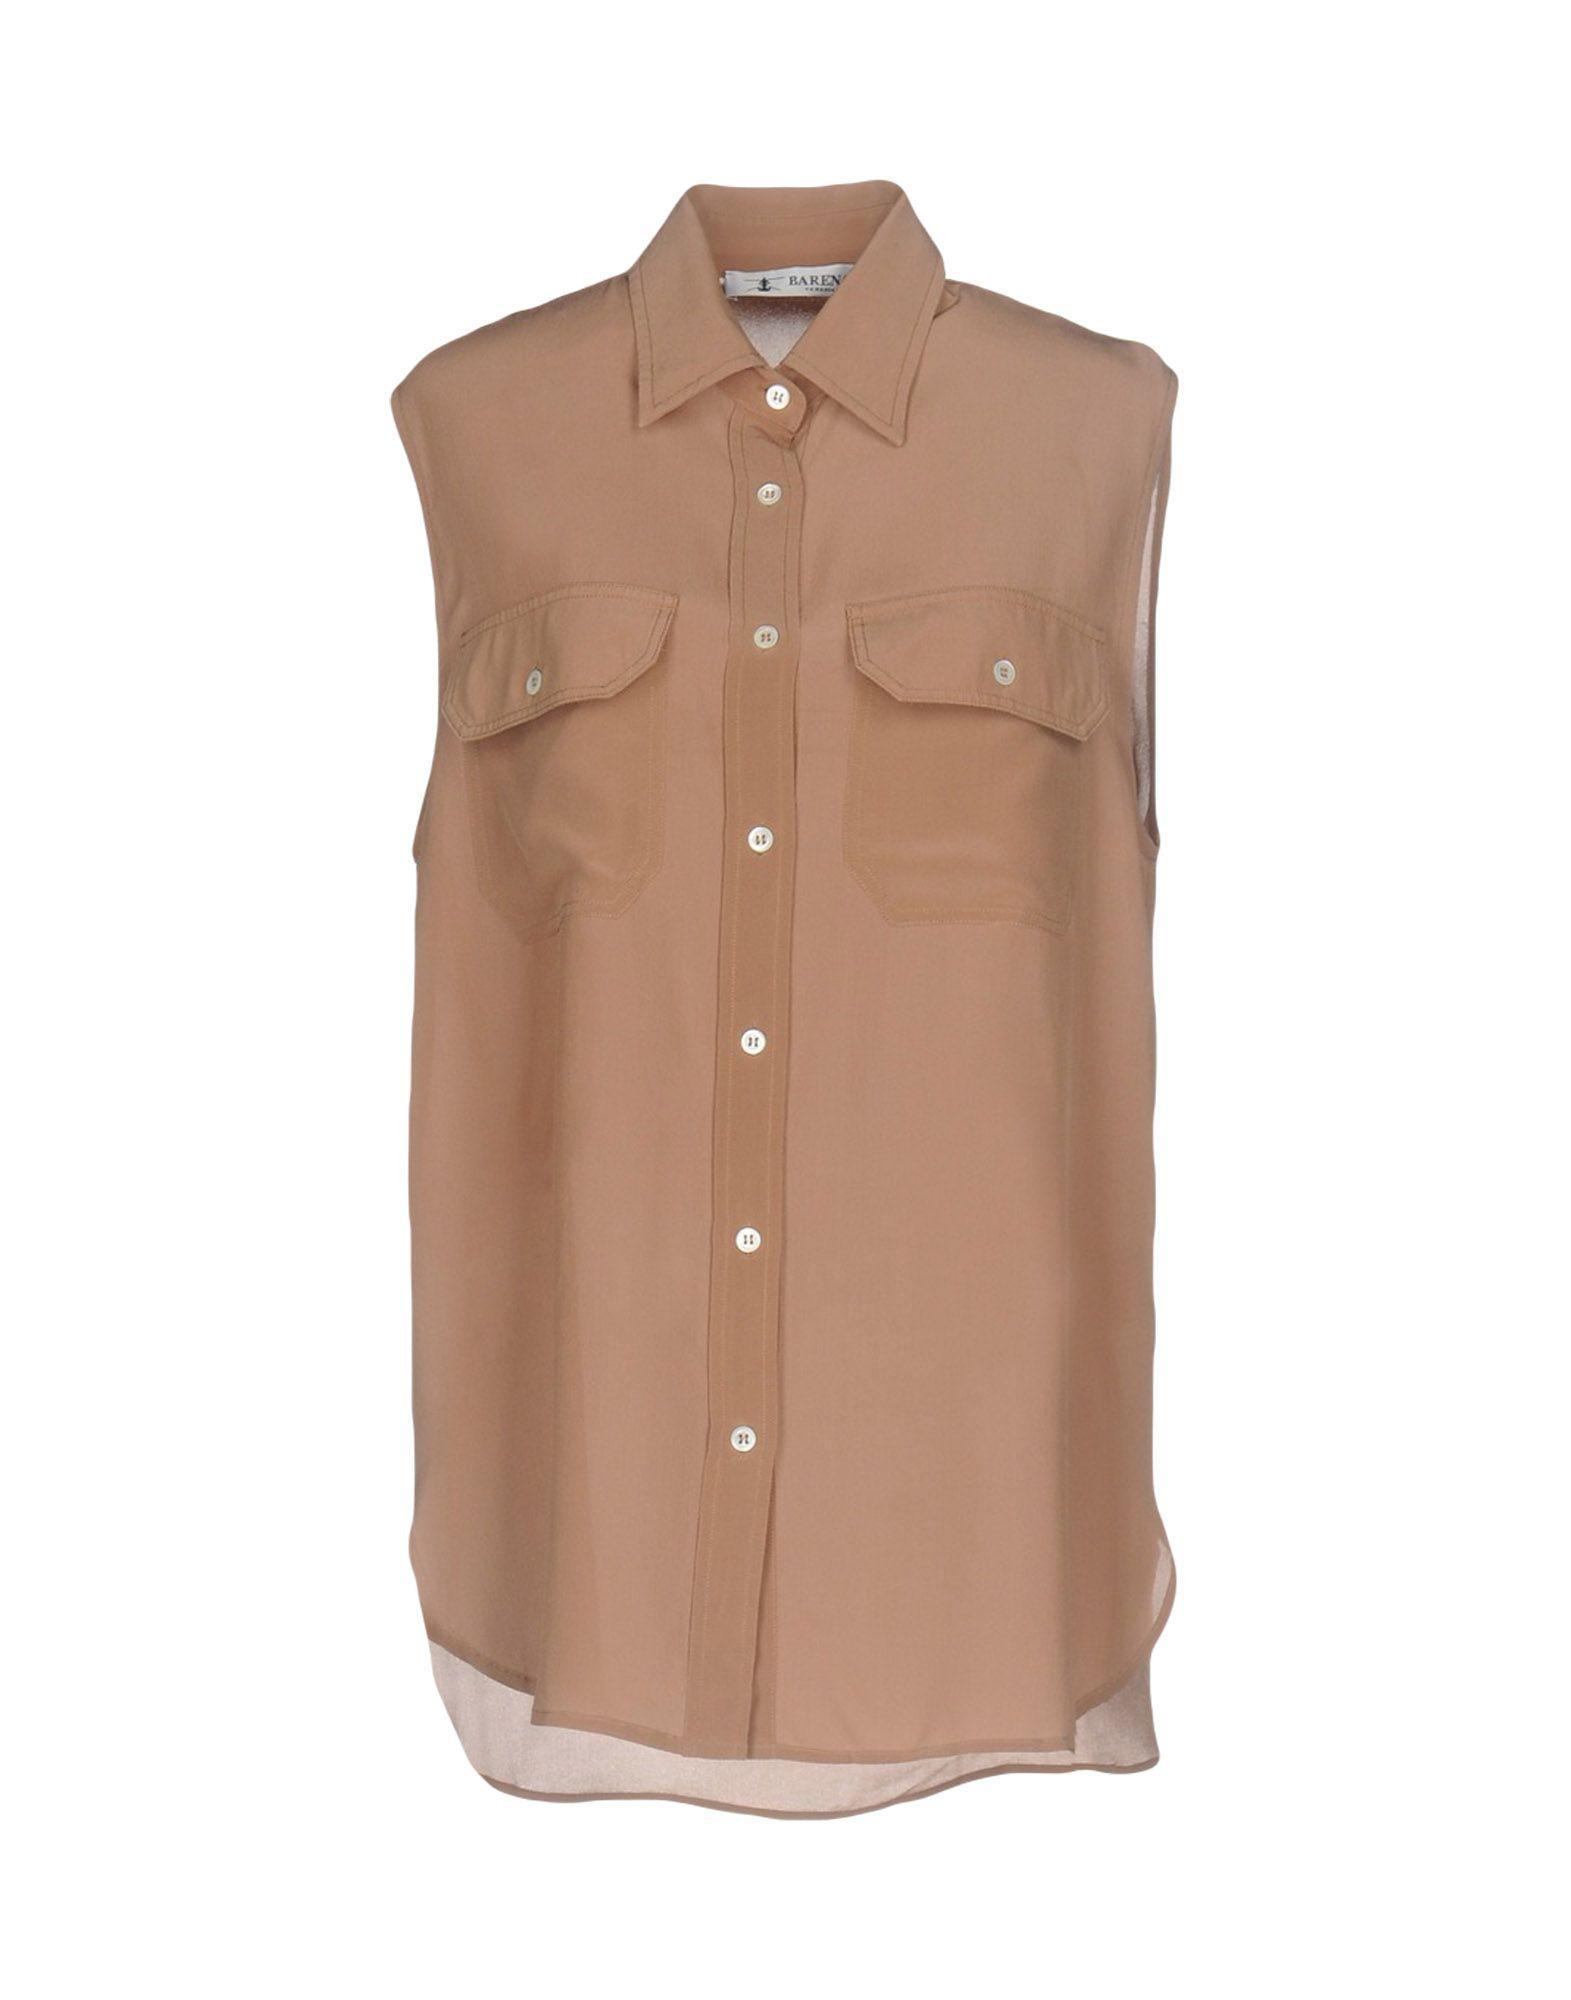 Barena Venezia Shirts In Light Brown